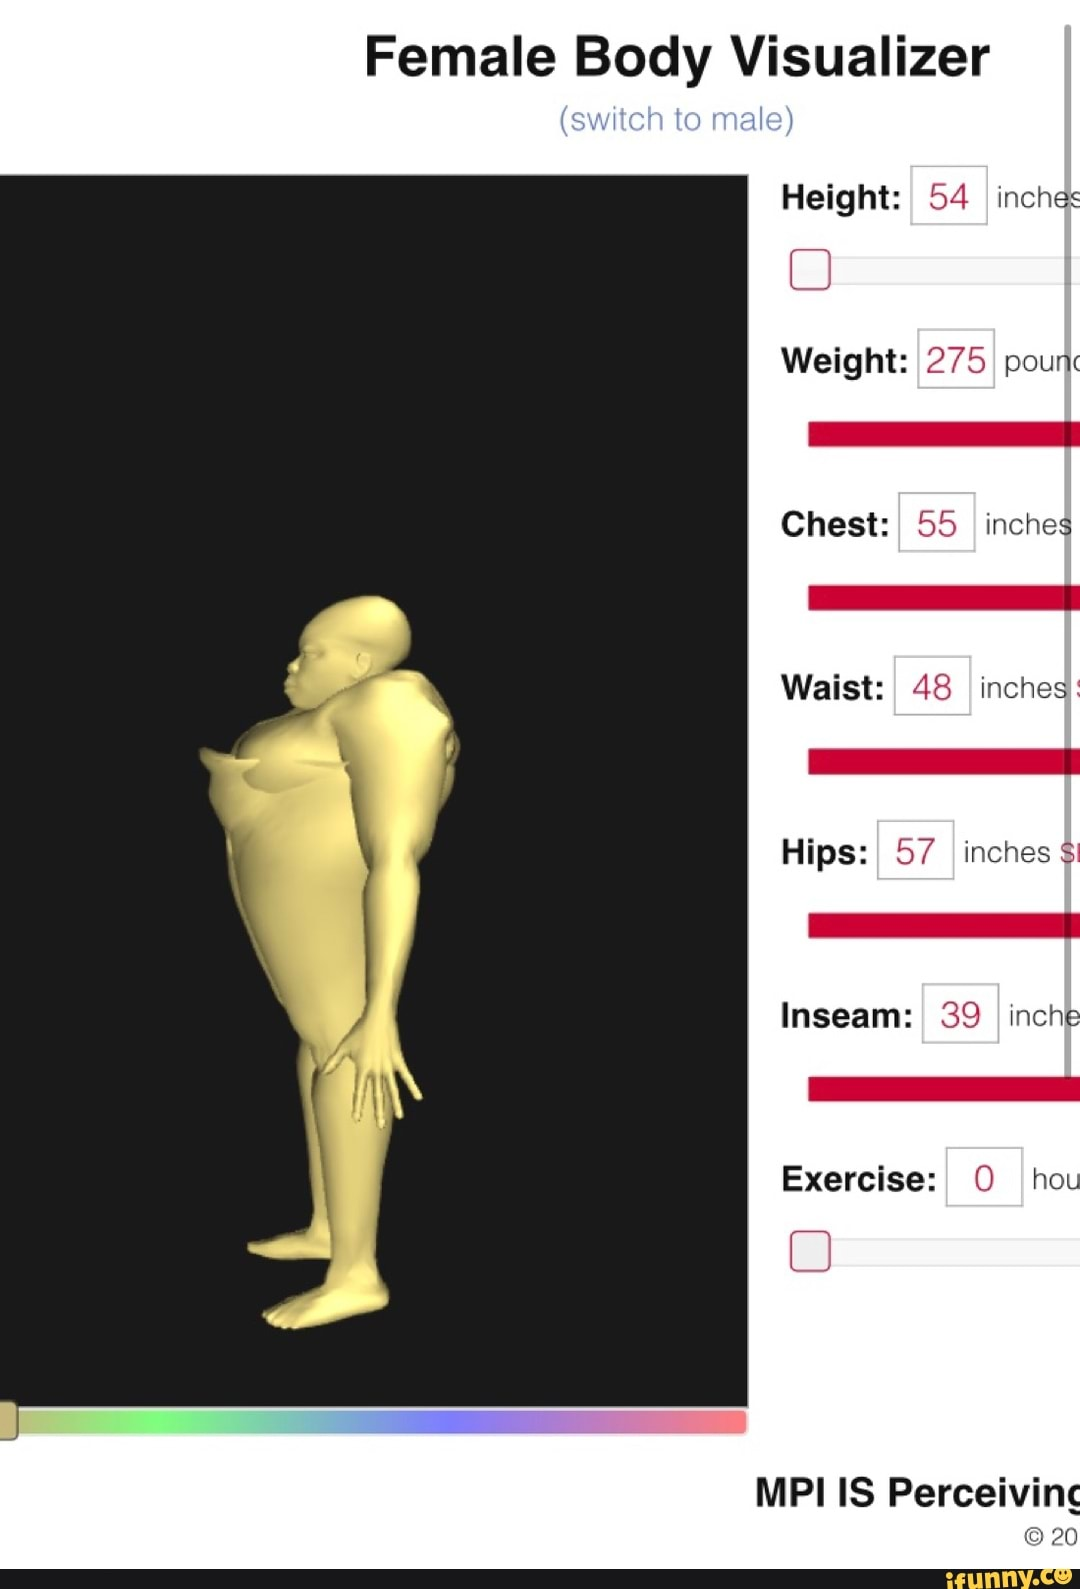 female body visualizer metric